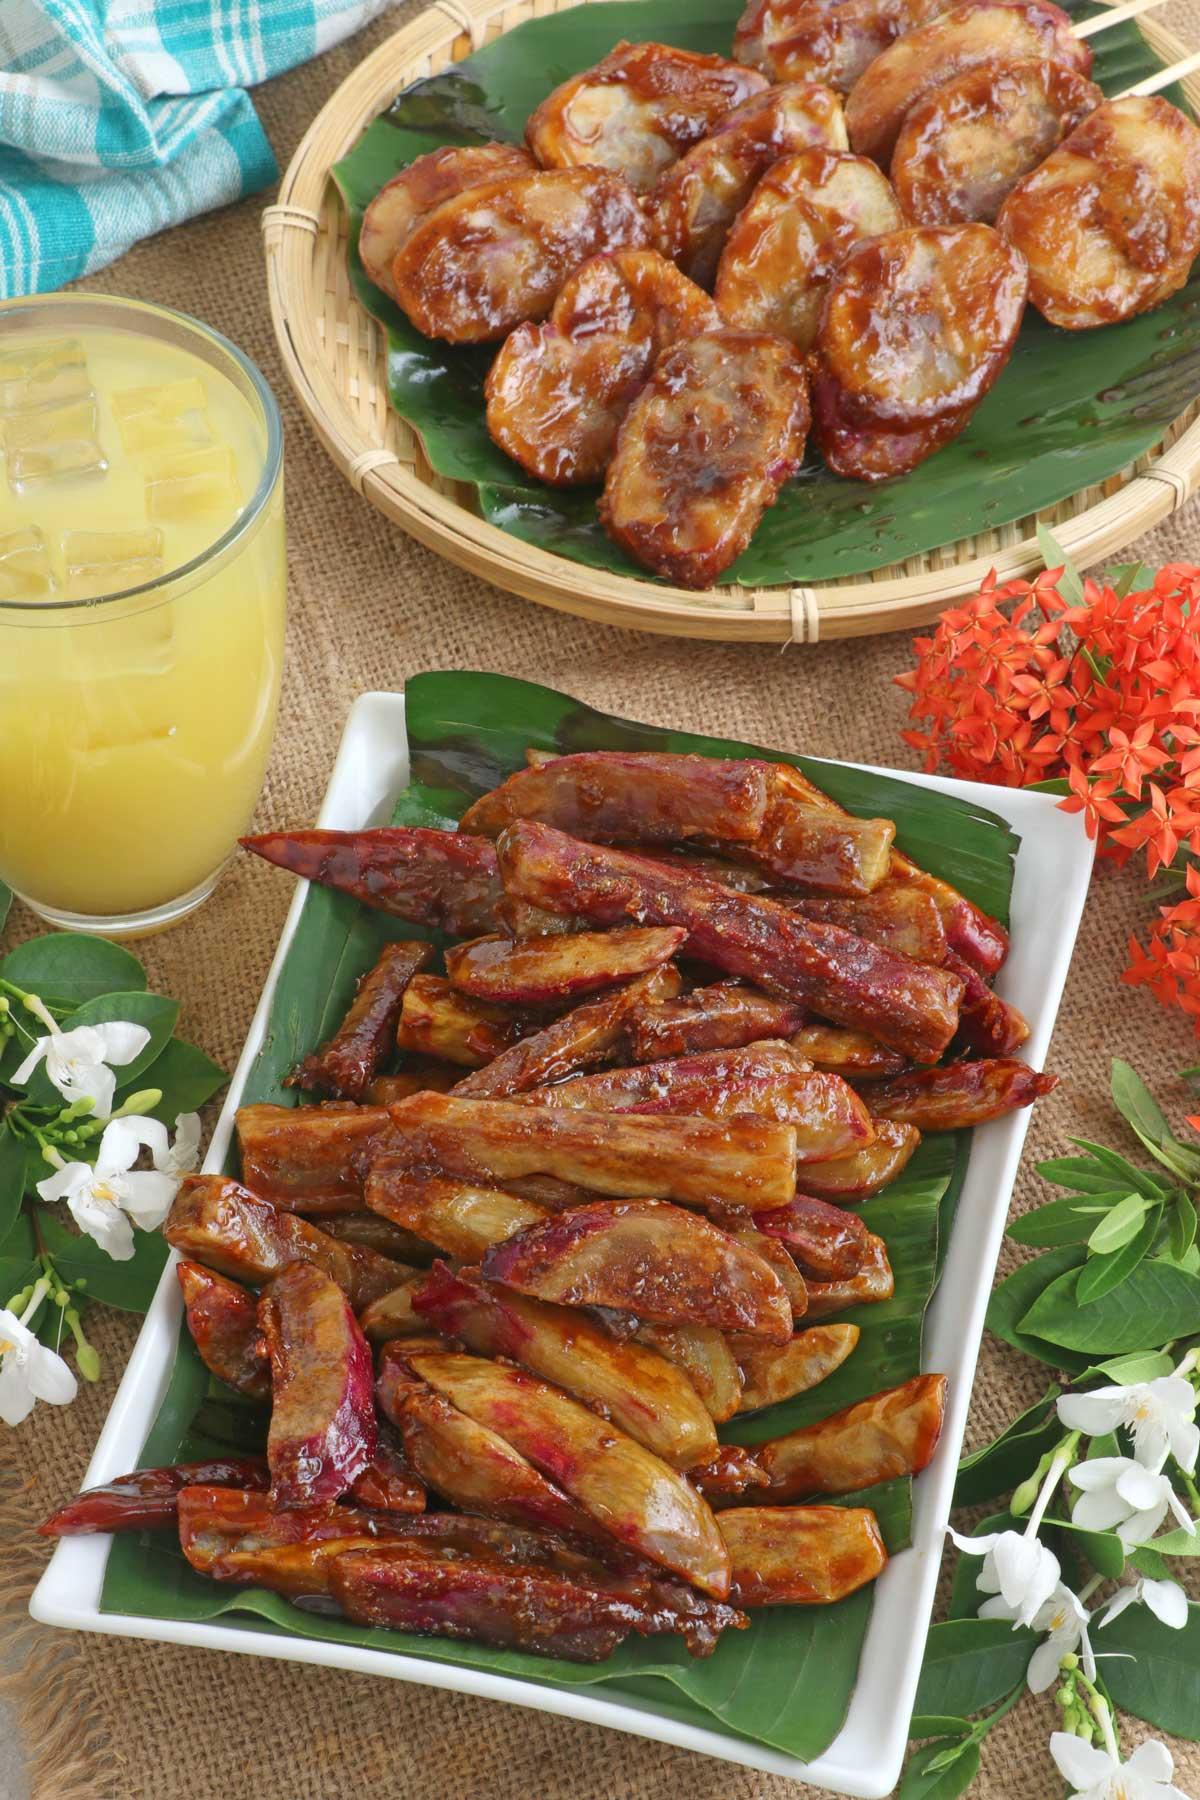 Kamote Cue and Kamote Fries